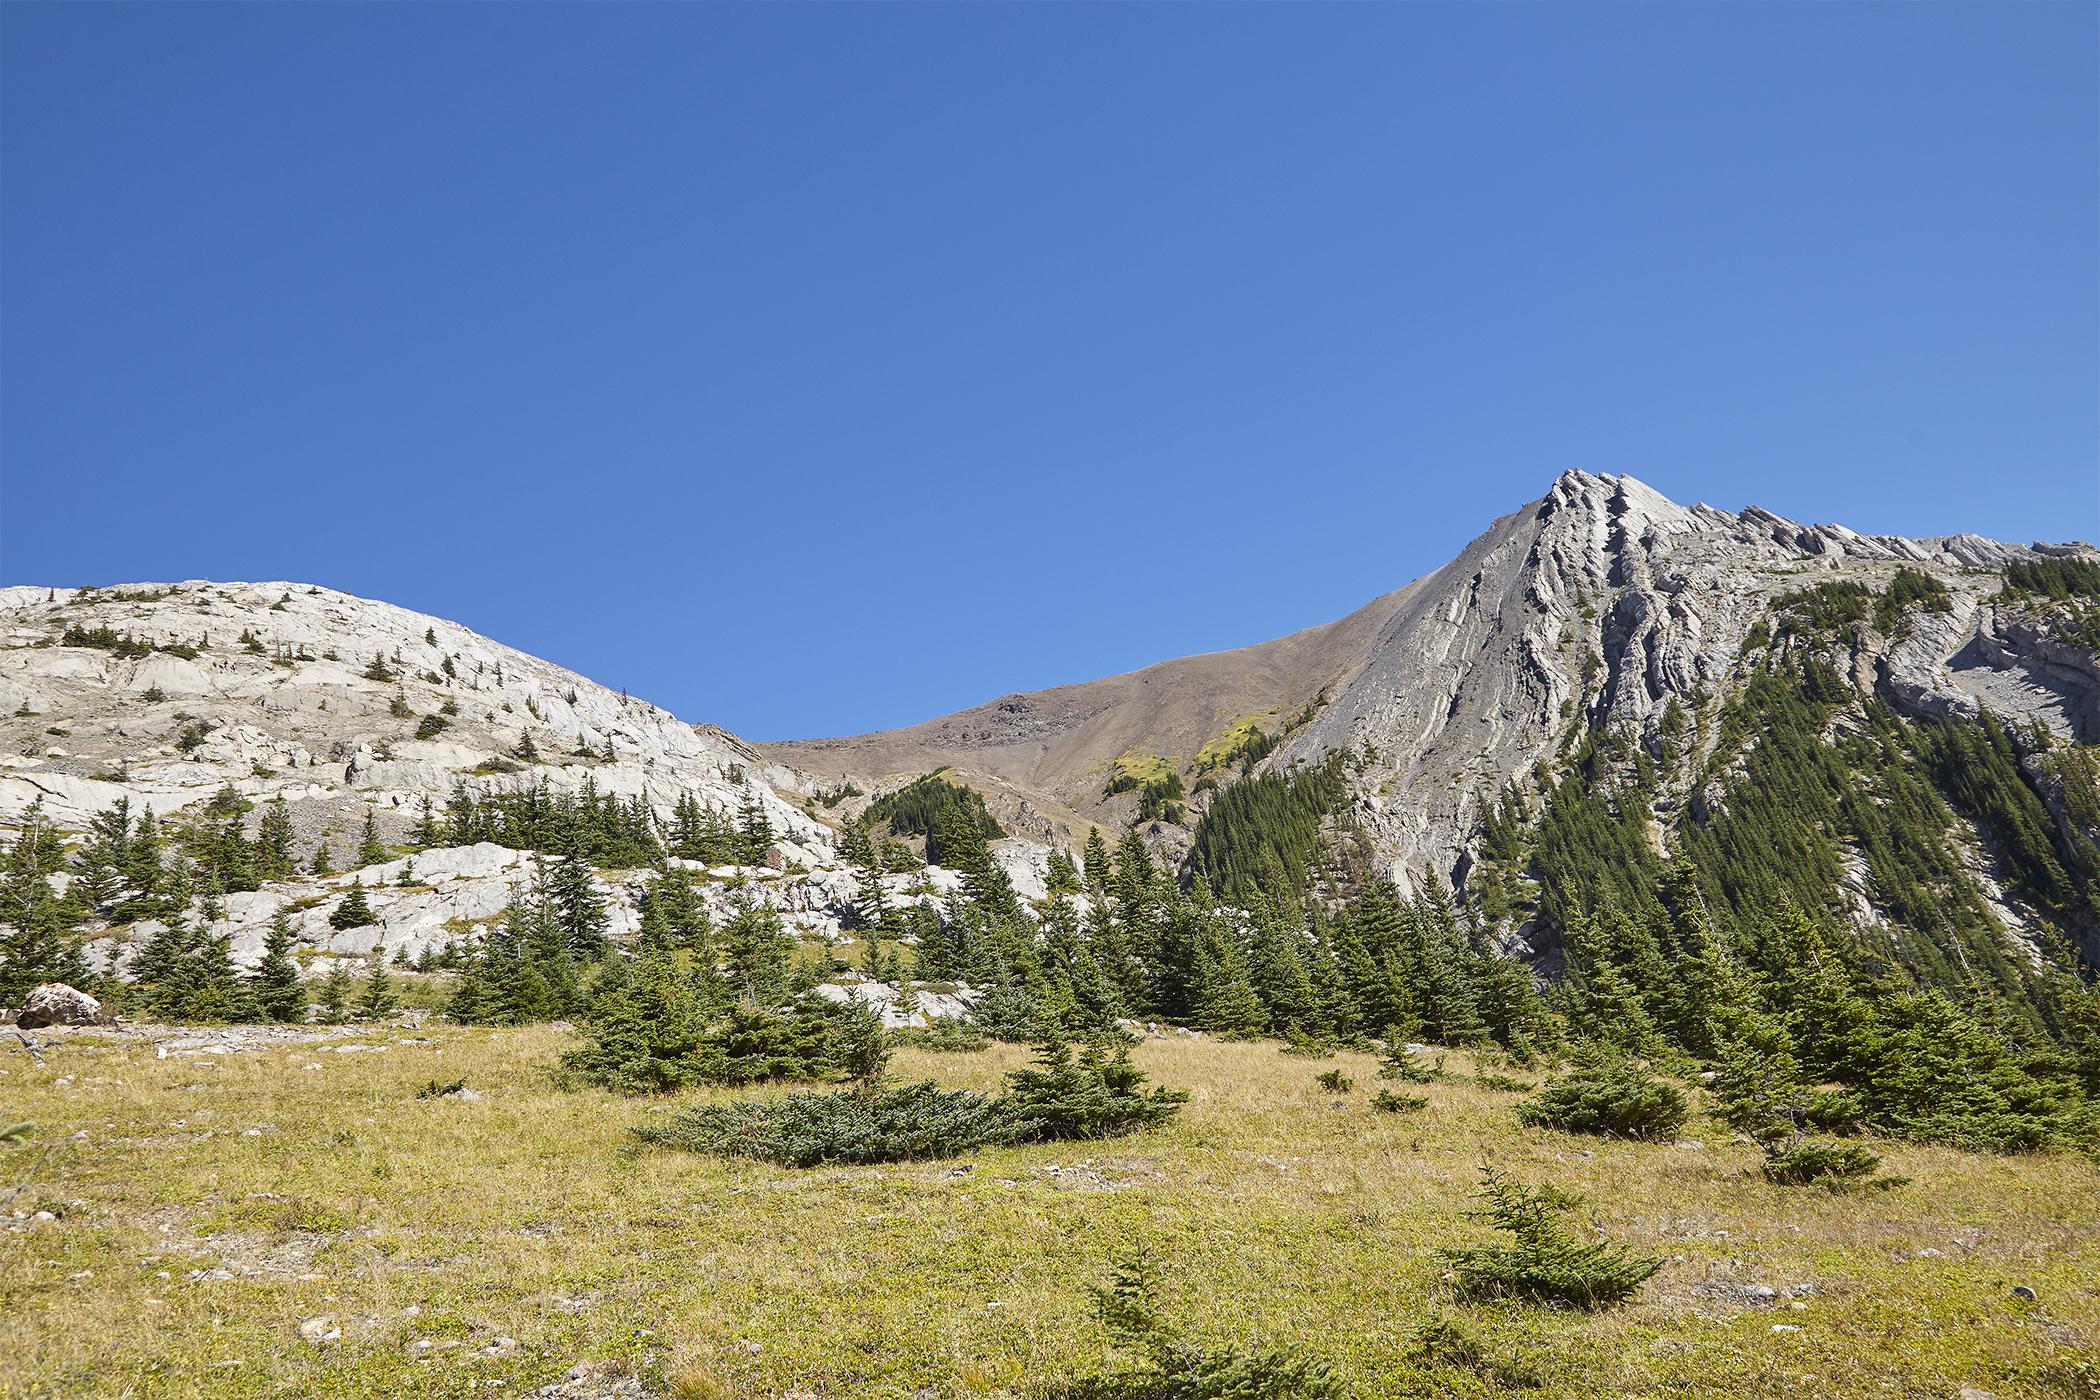 Opal Ridge from near the tree line.